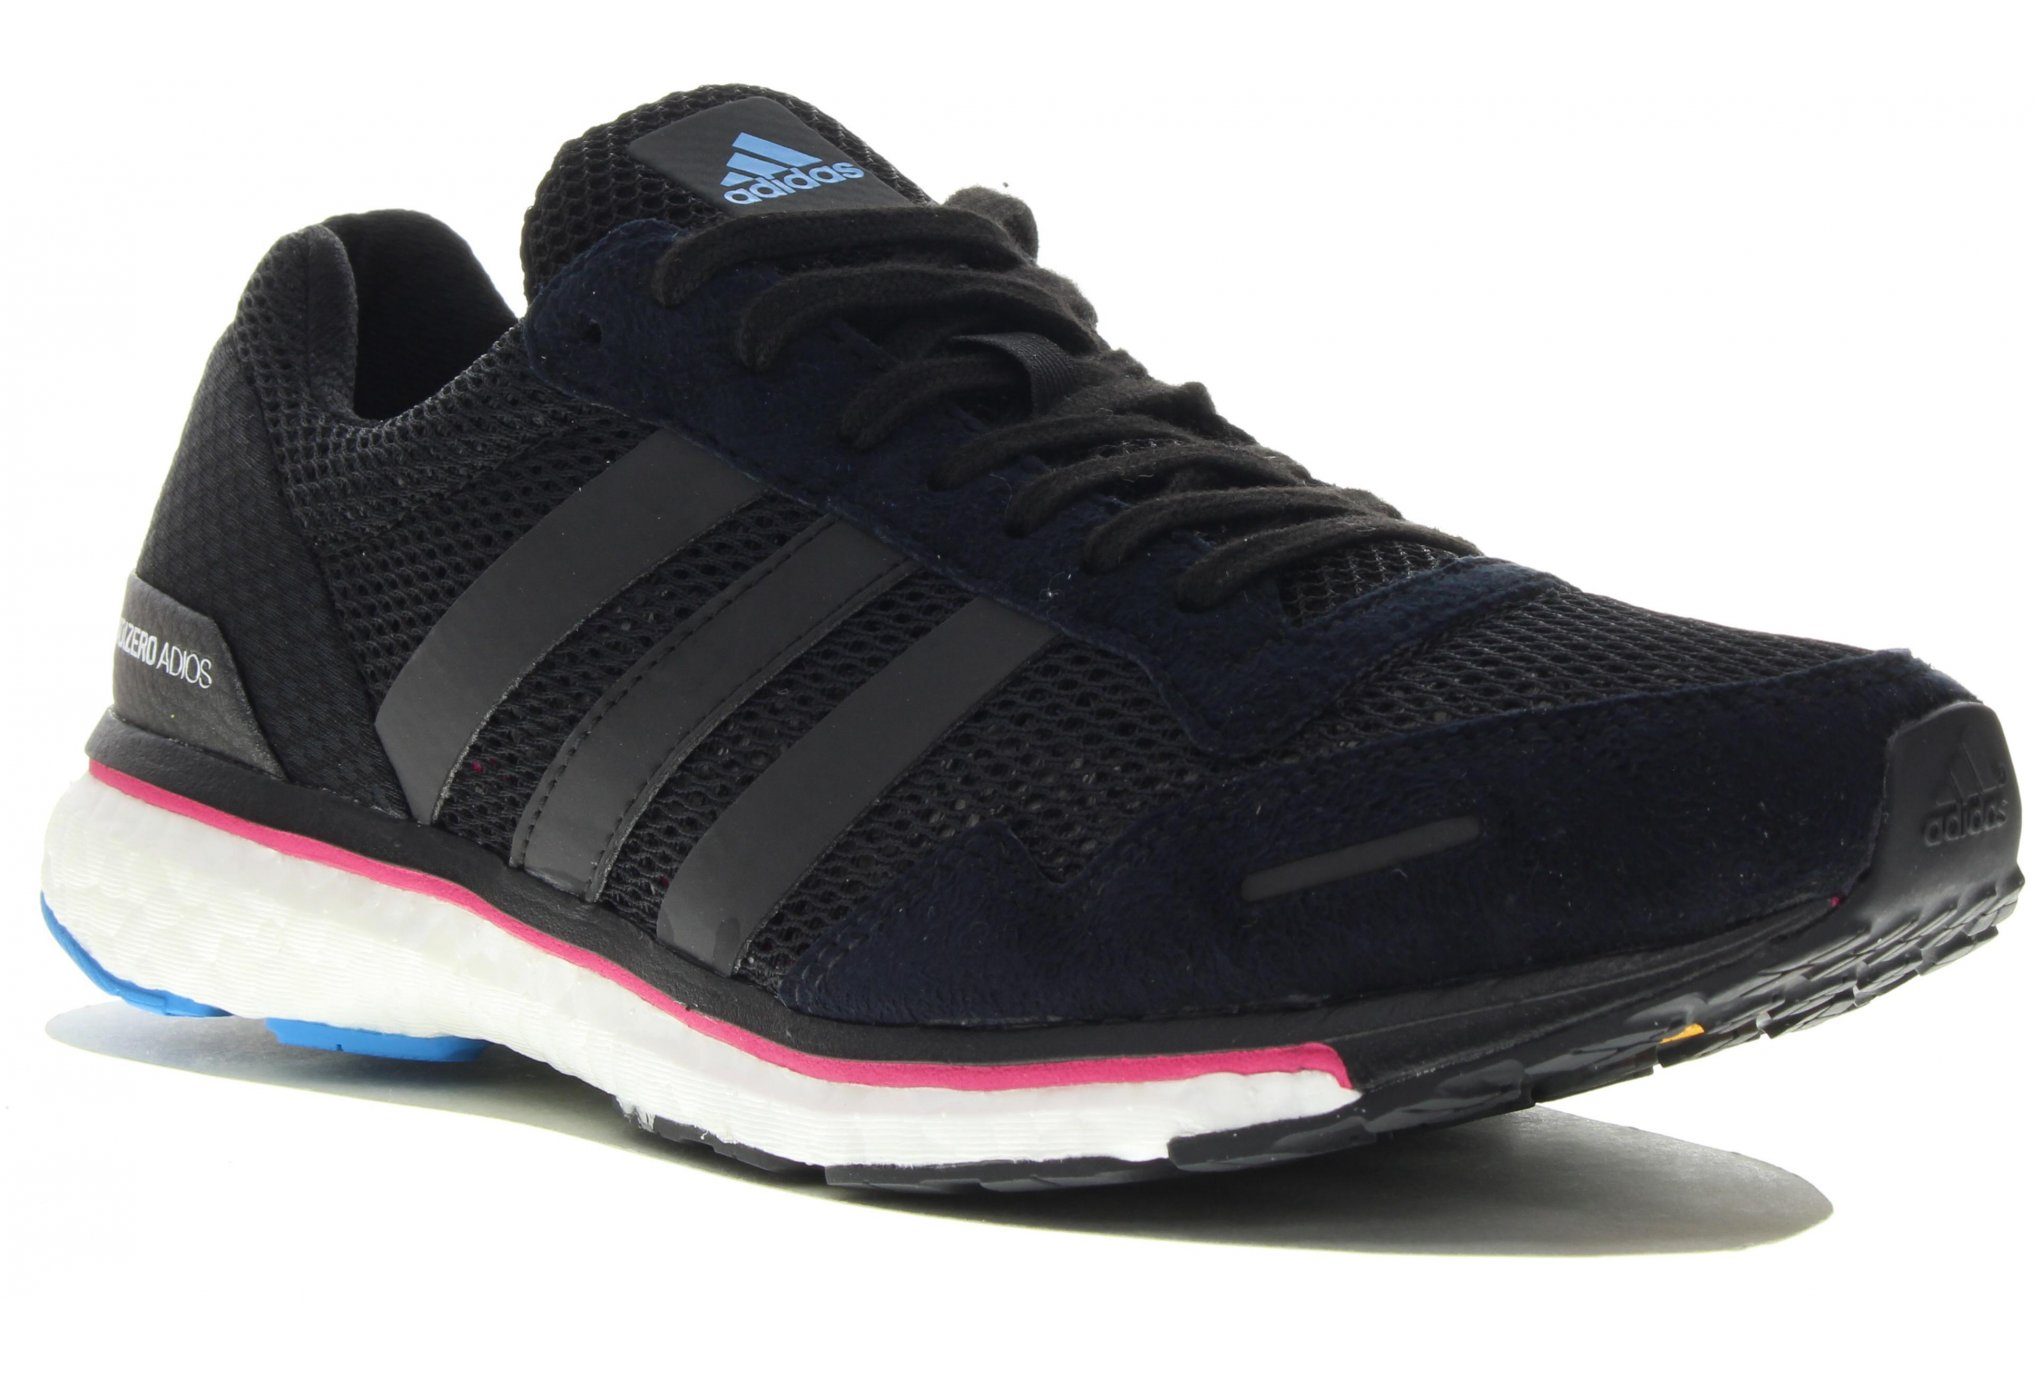 adidas adizero adios Boost 3 Chaussures running femme